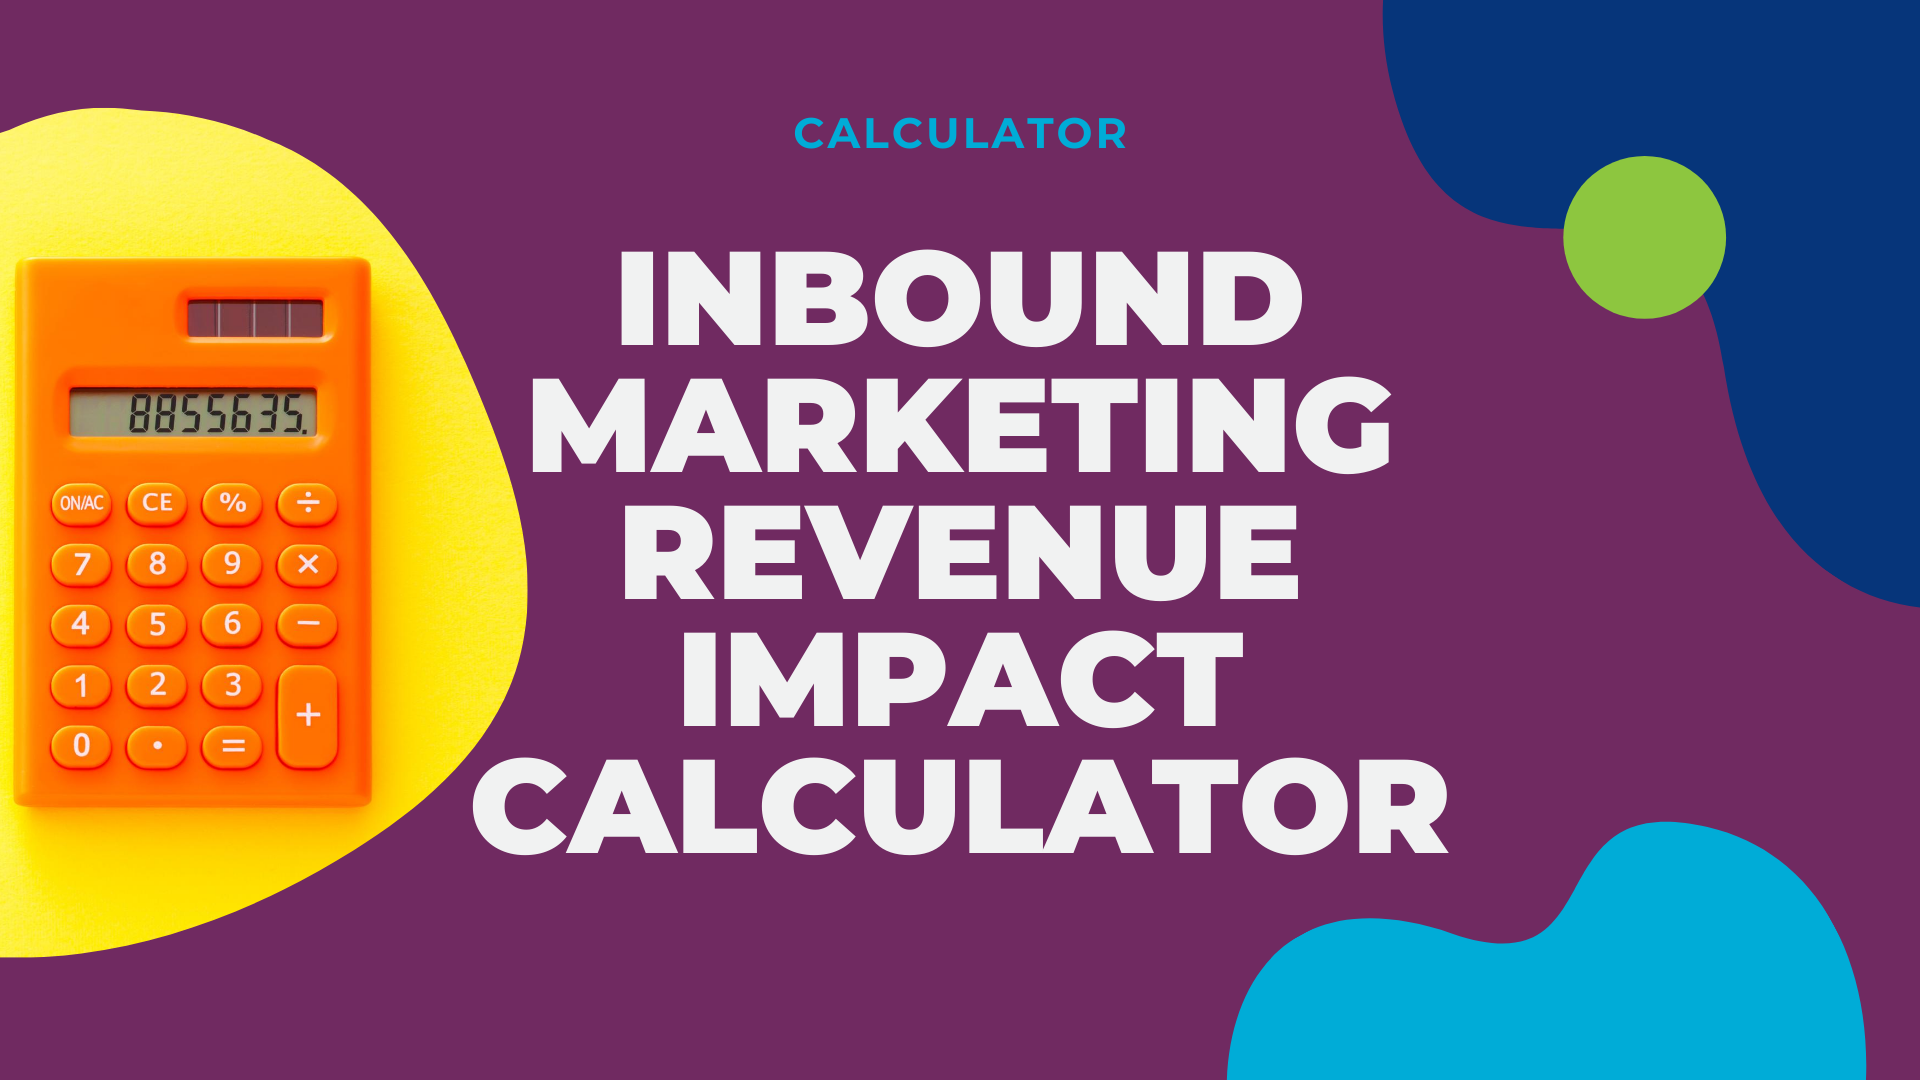 LG2 Website Resource - Inbound marketing revenue impact calculator